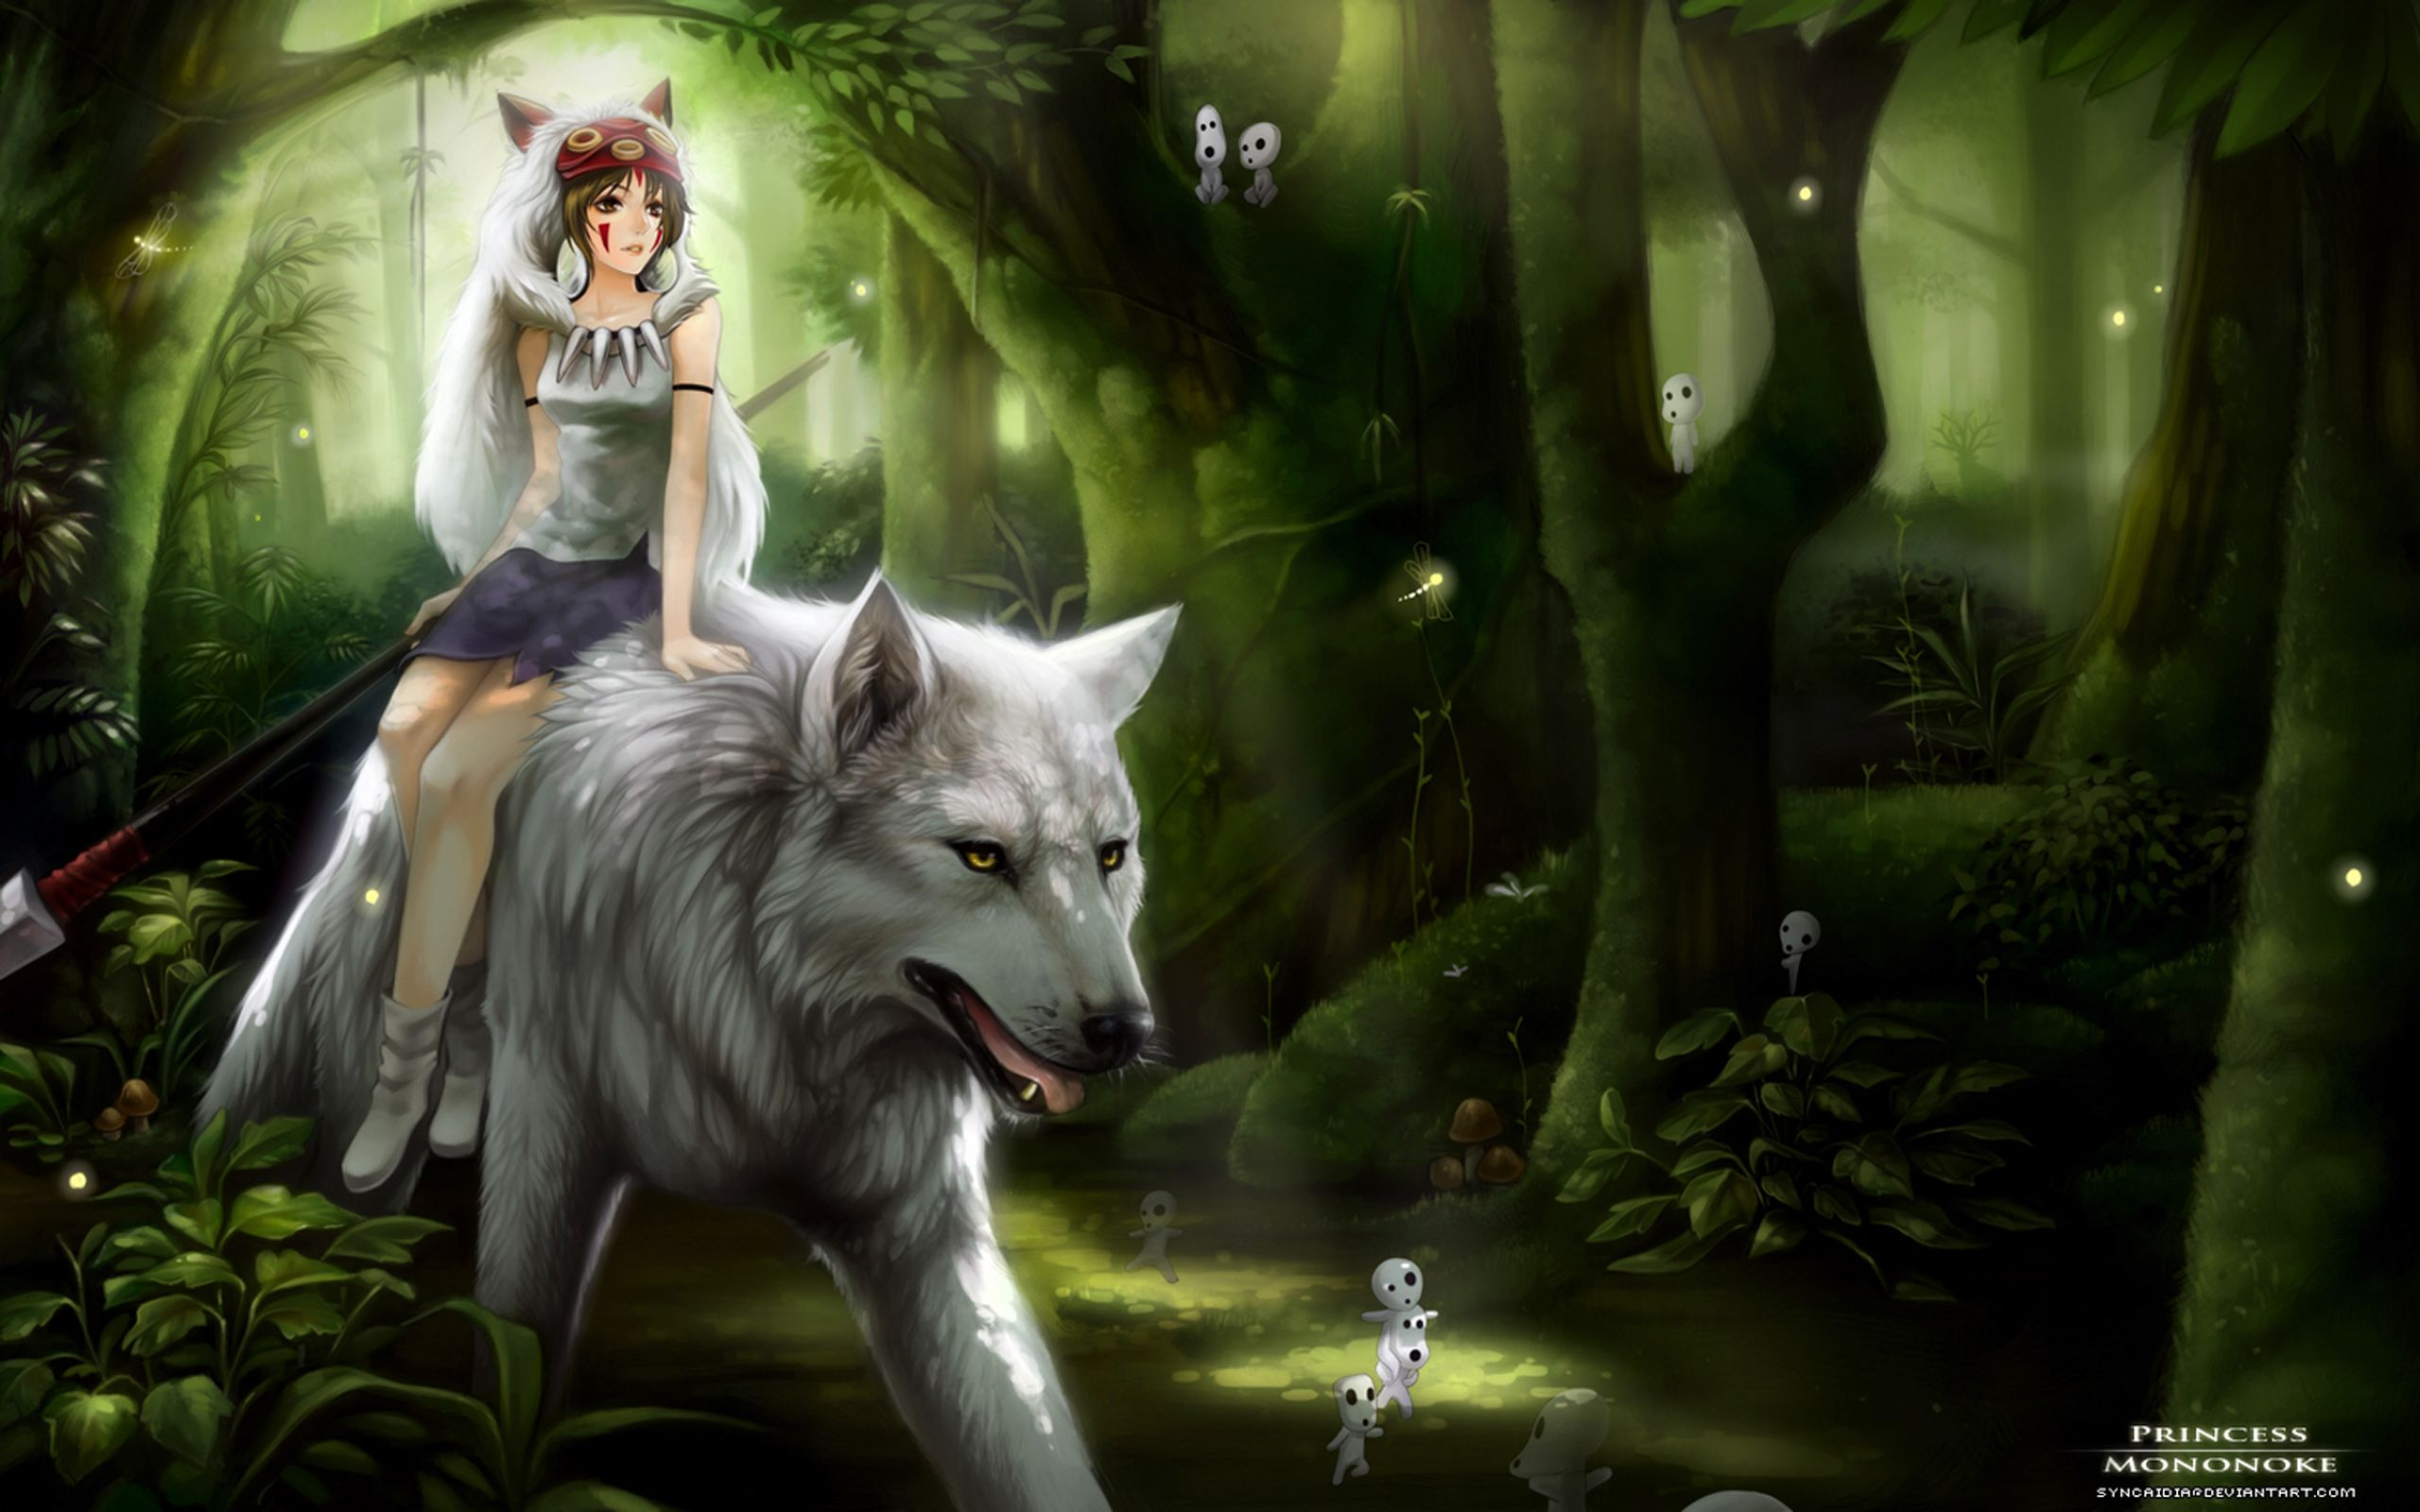 Princess Mononoke Hd Wallpapers Backgrounds Wallpaper Abyss